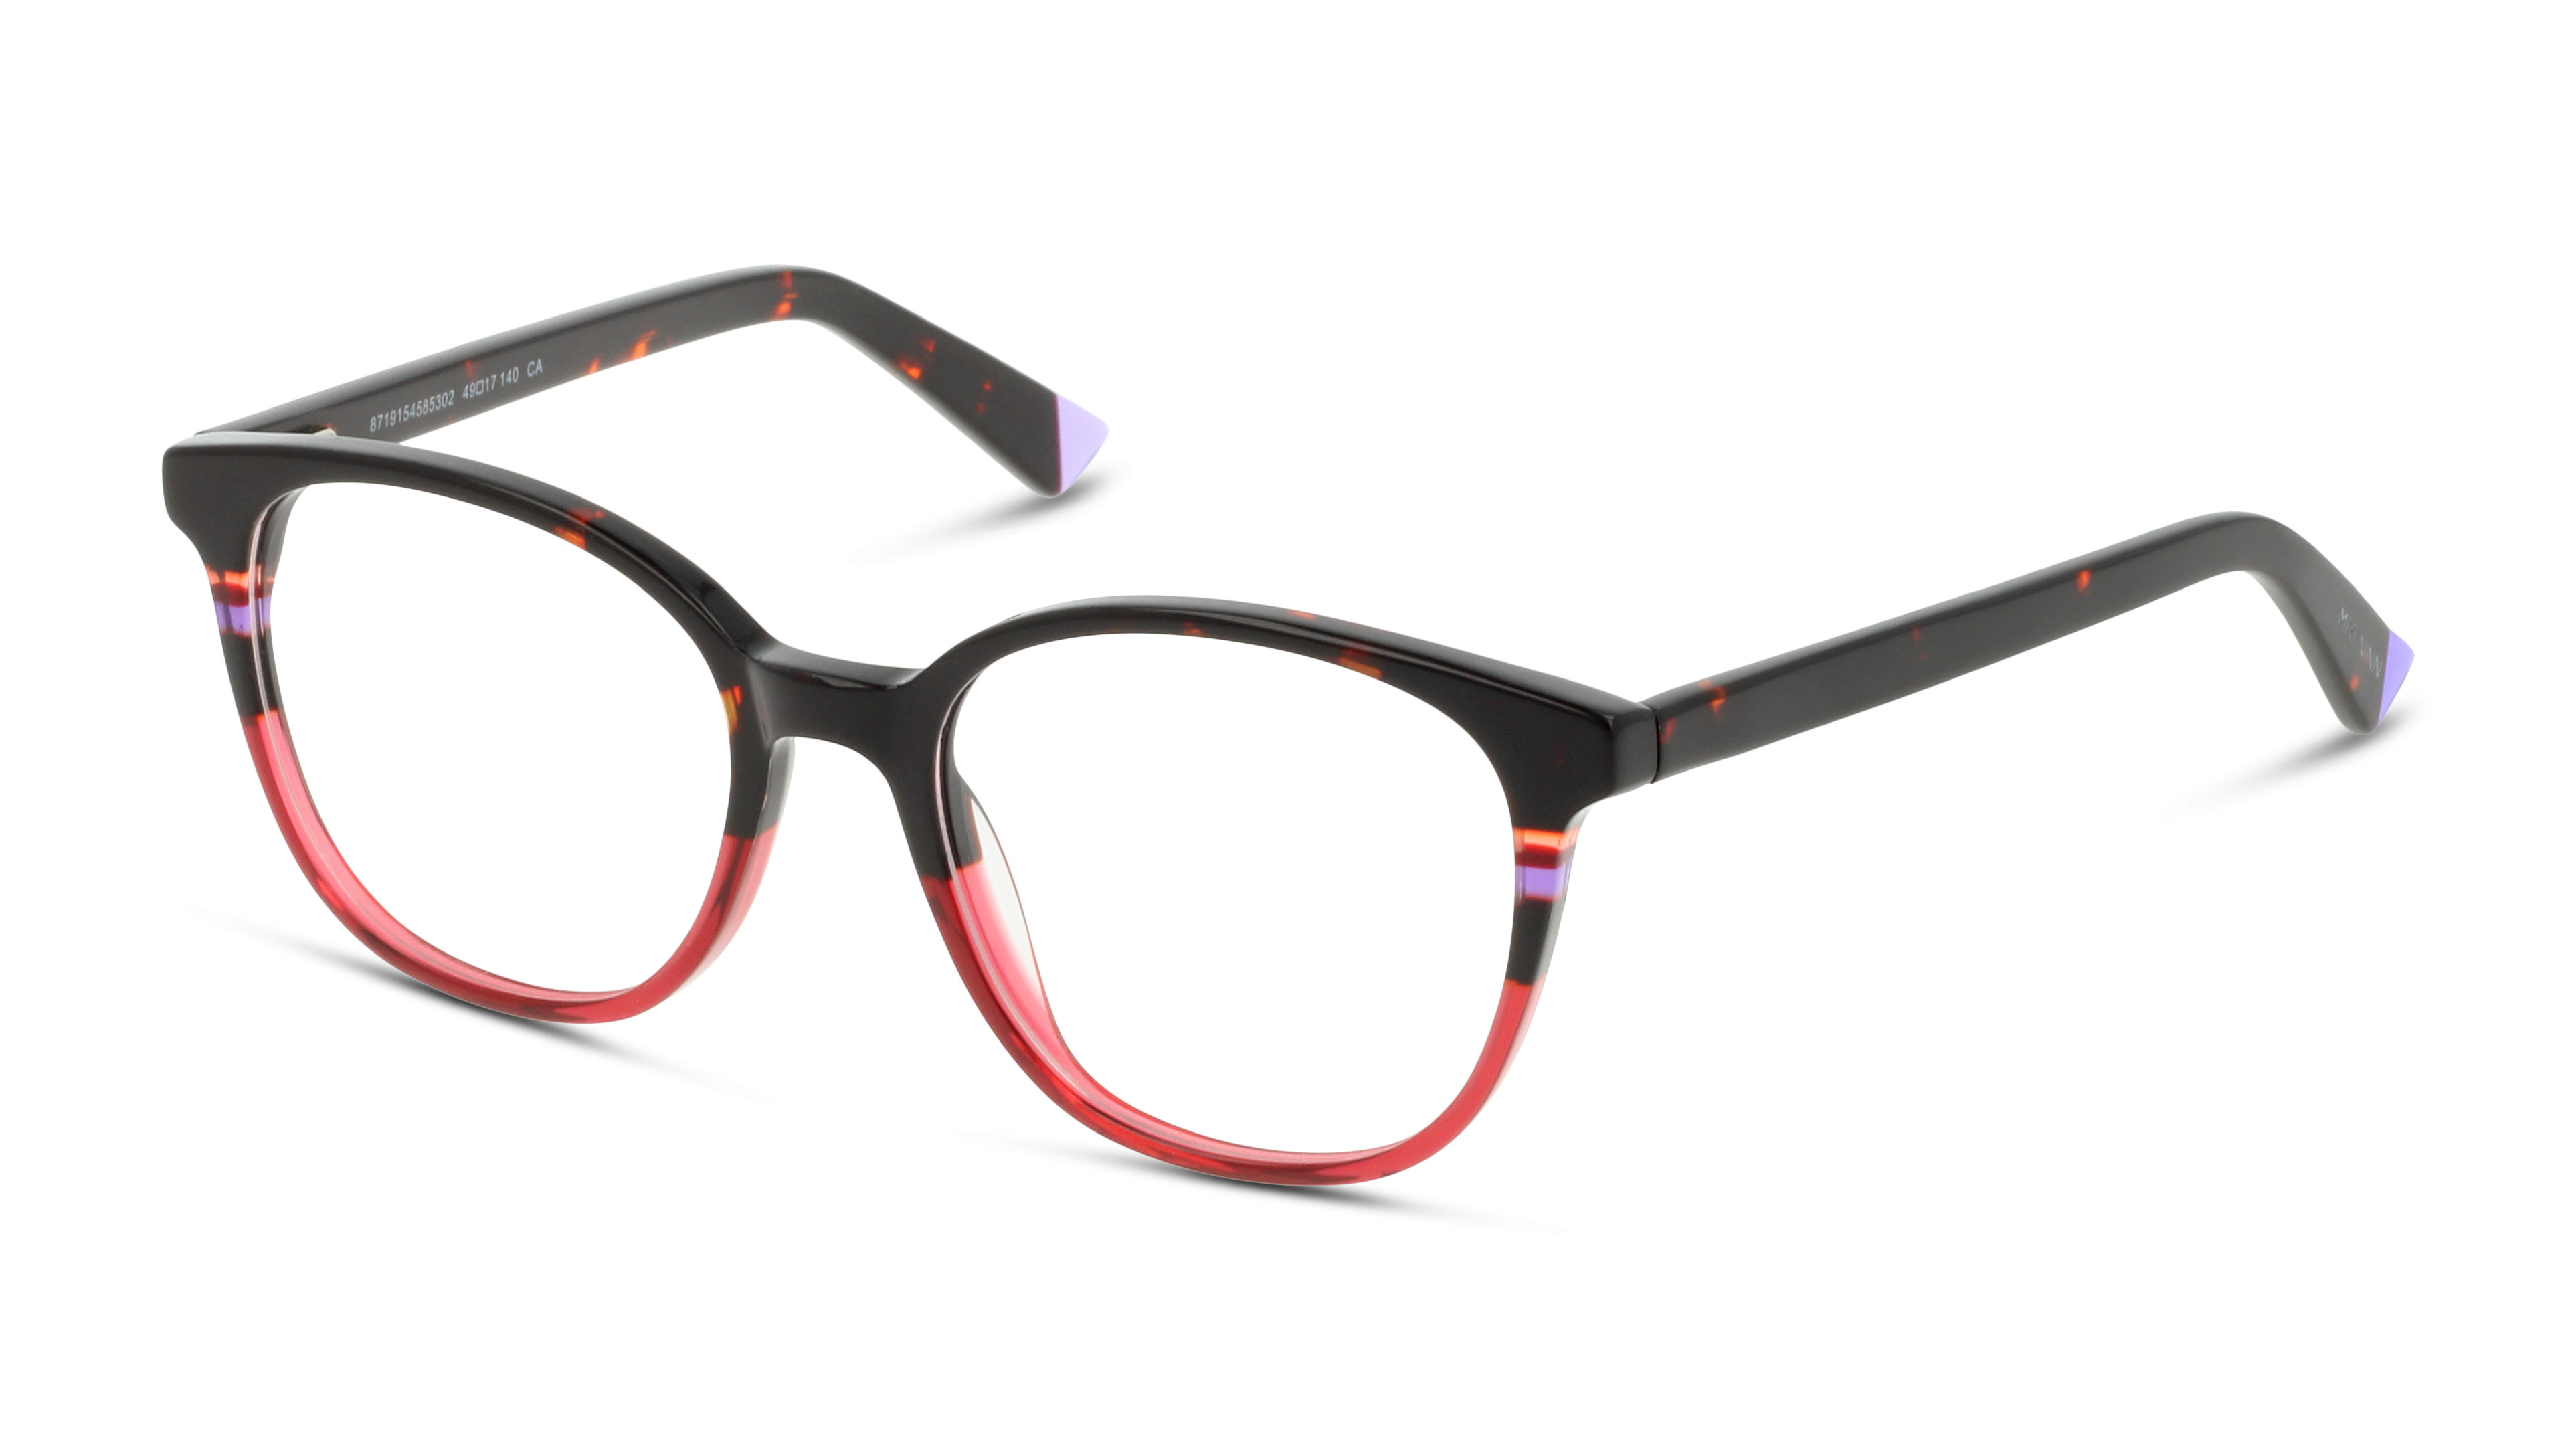 8719154585302-angle-03-miki-ninn-mnkf13-eyewear-havana-red